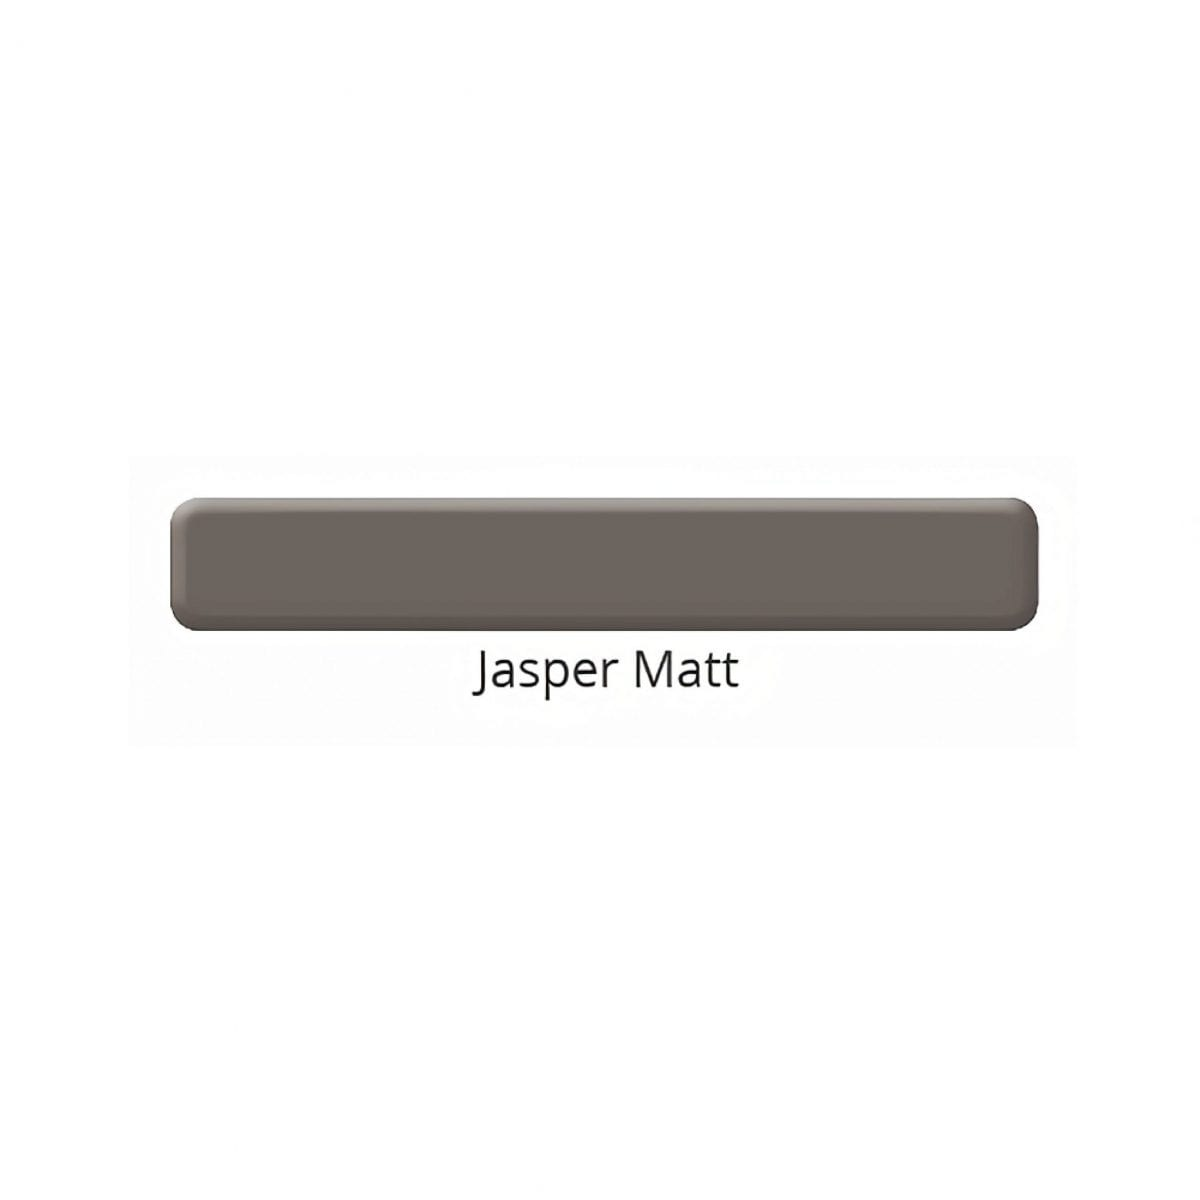 Jasper Matt color